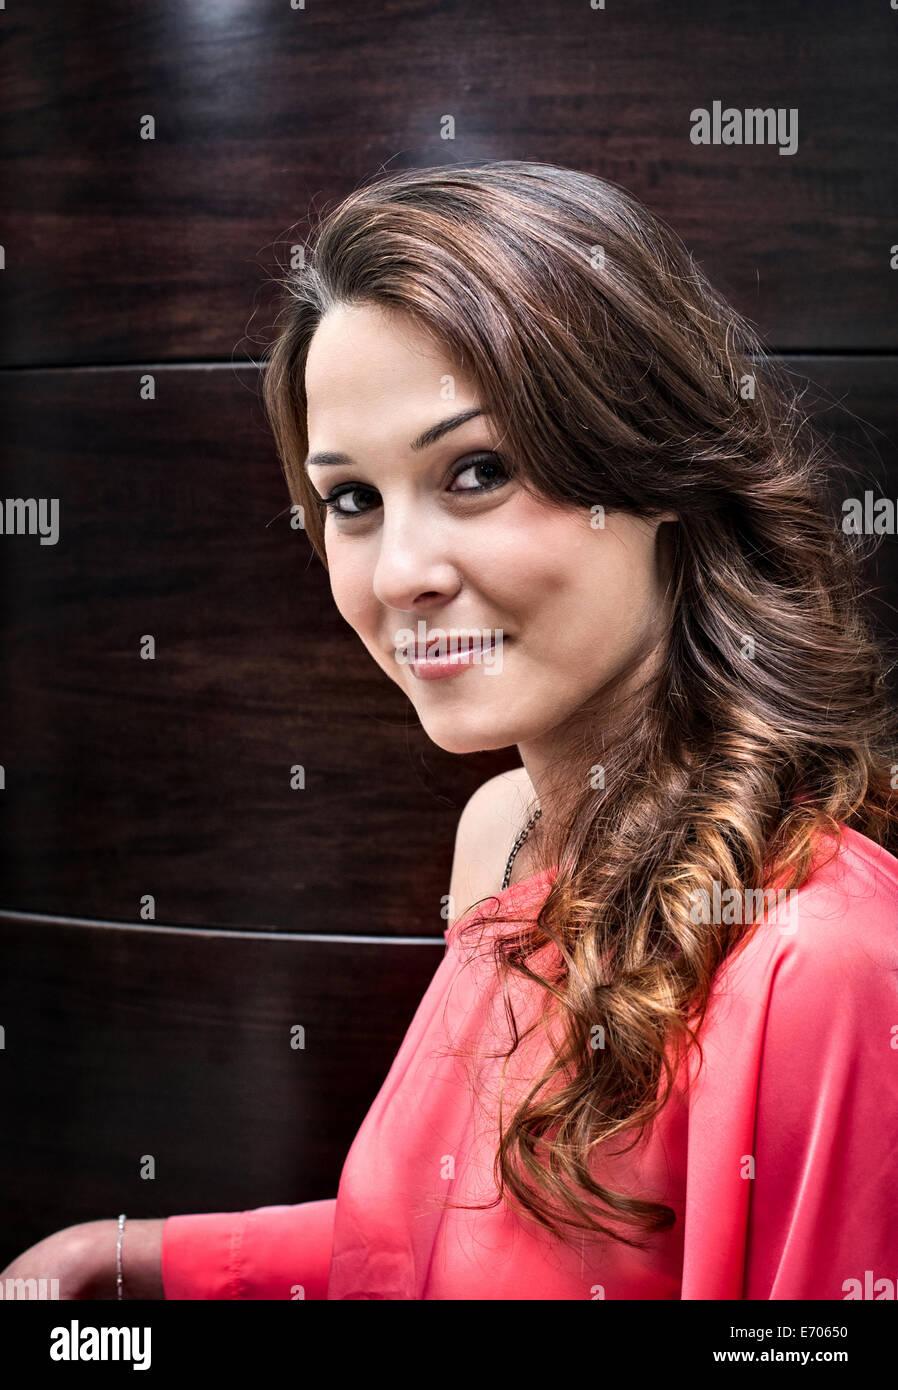 Porträt der jungen Frau im Friseursalon mit langen Ringletted brünette Haare Stockbild